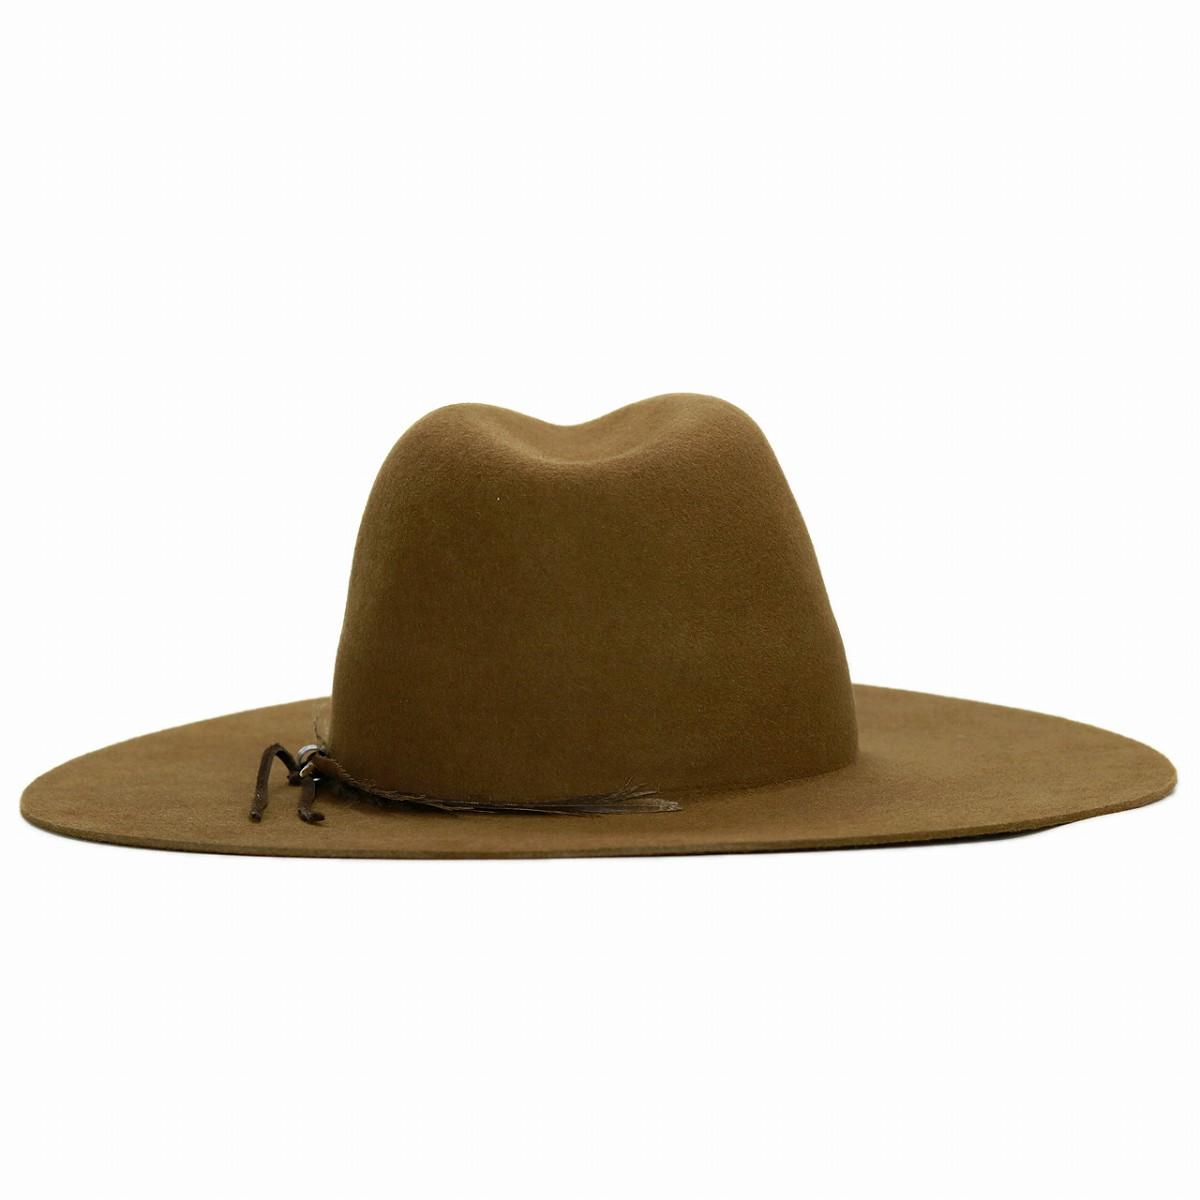 ... Hat felt cowboy hat trilby hat gentleman 57cm 59cm brown camel  cowboy  hat  made ... ea7a4693c61